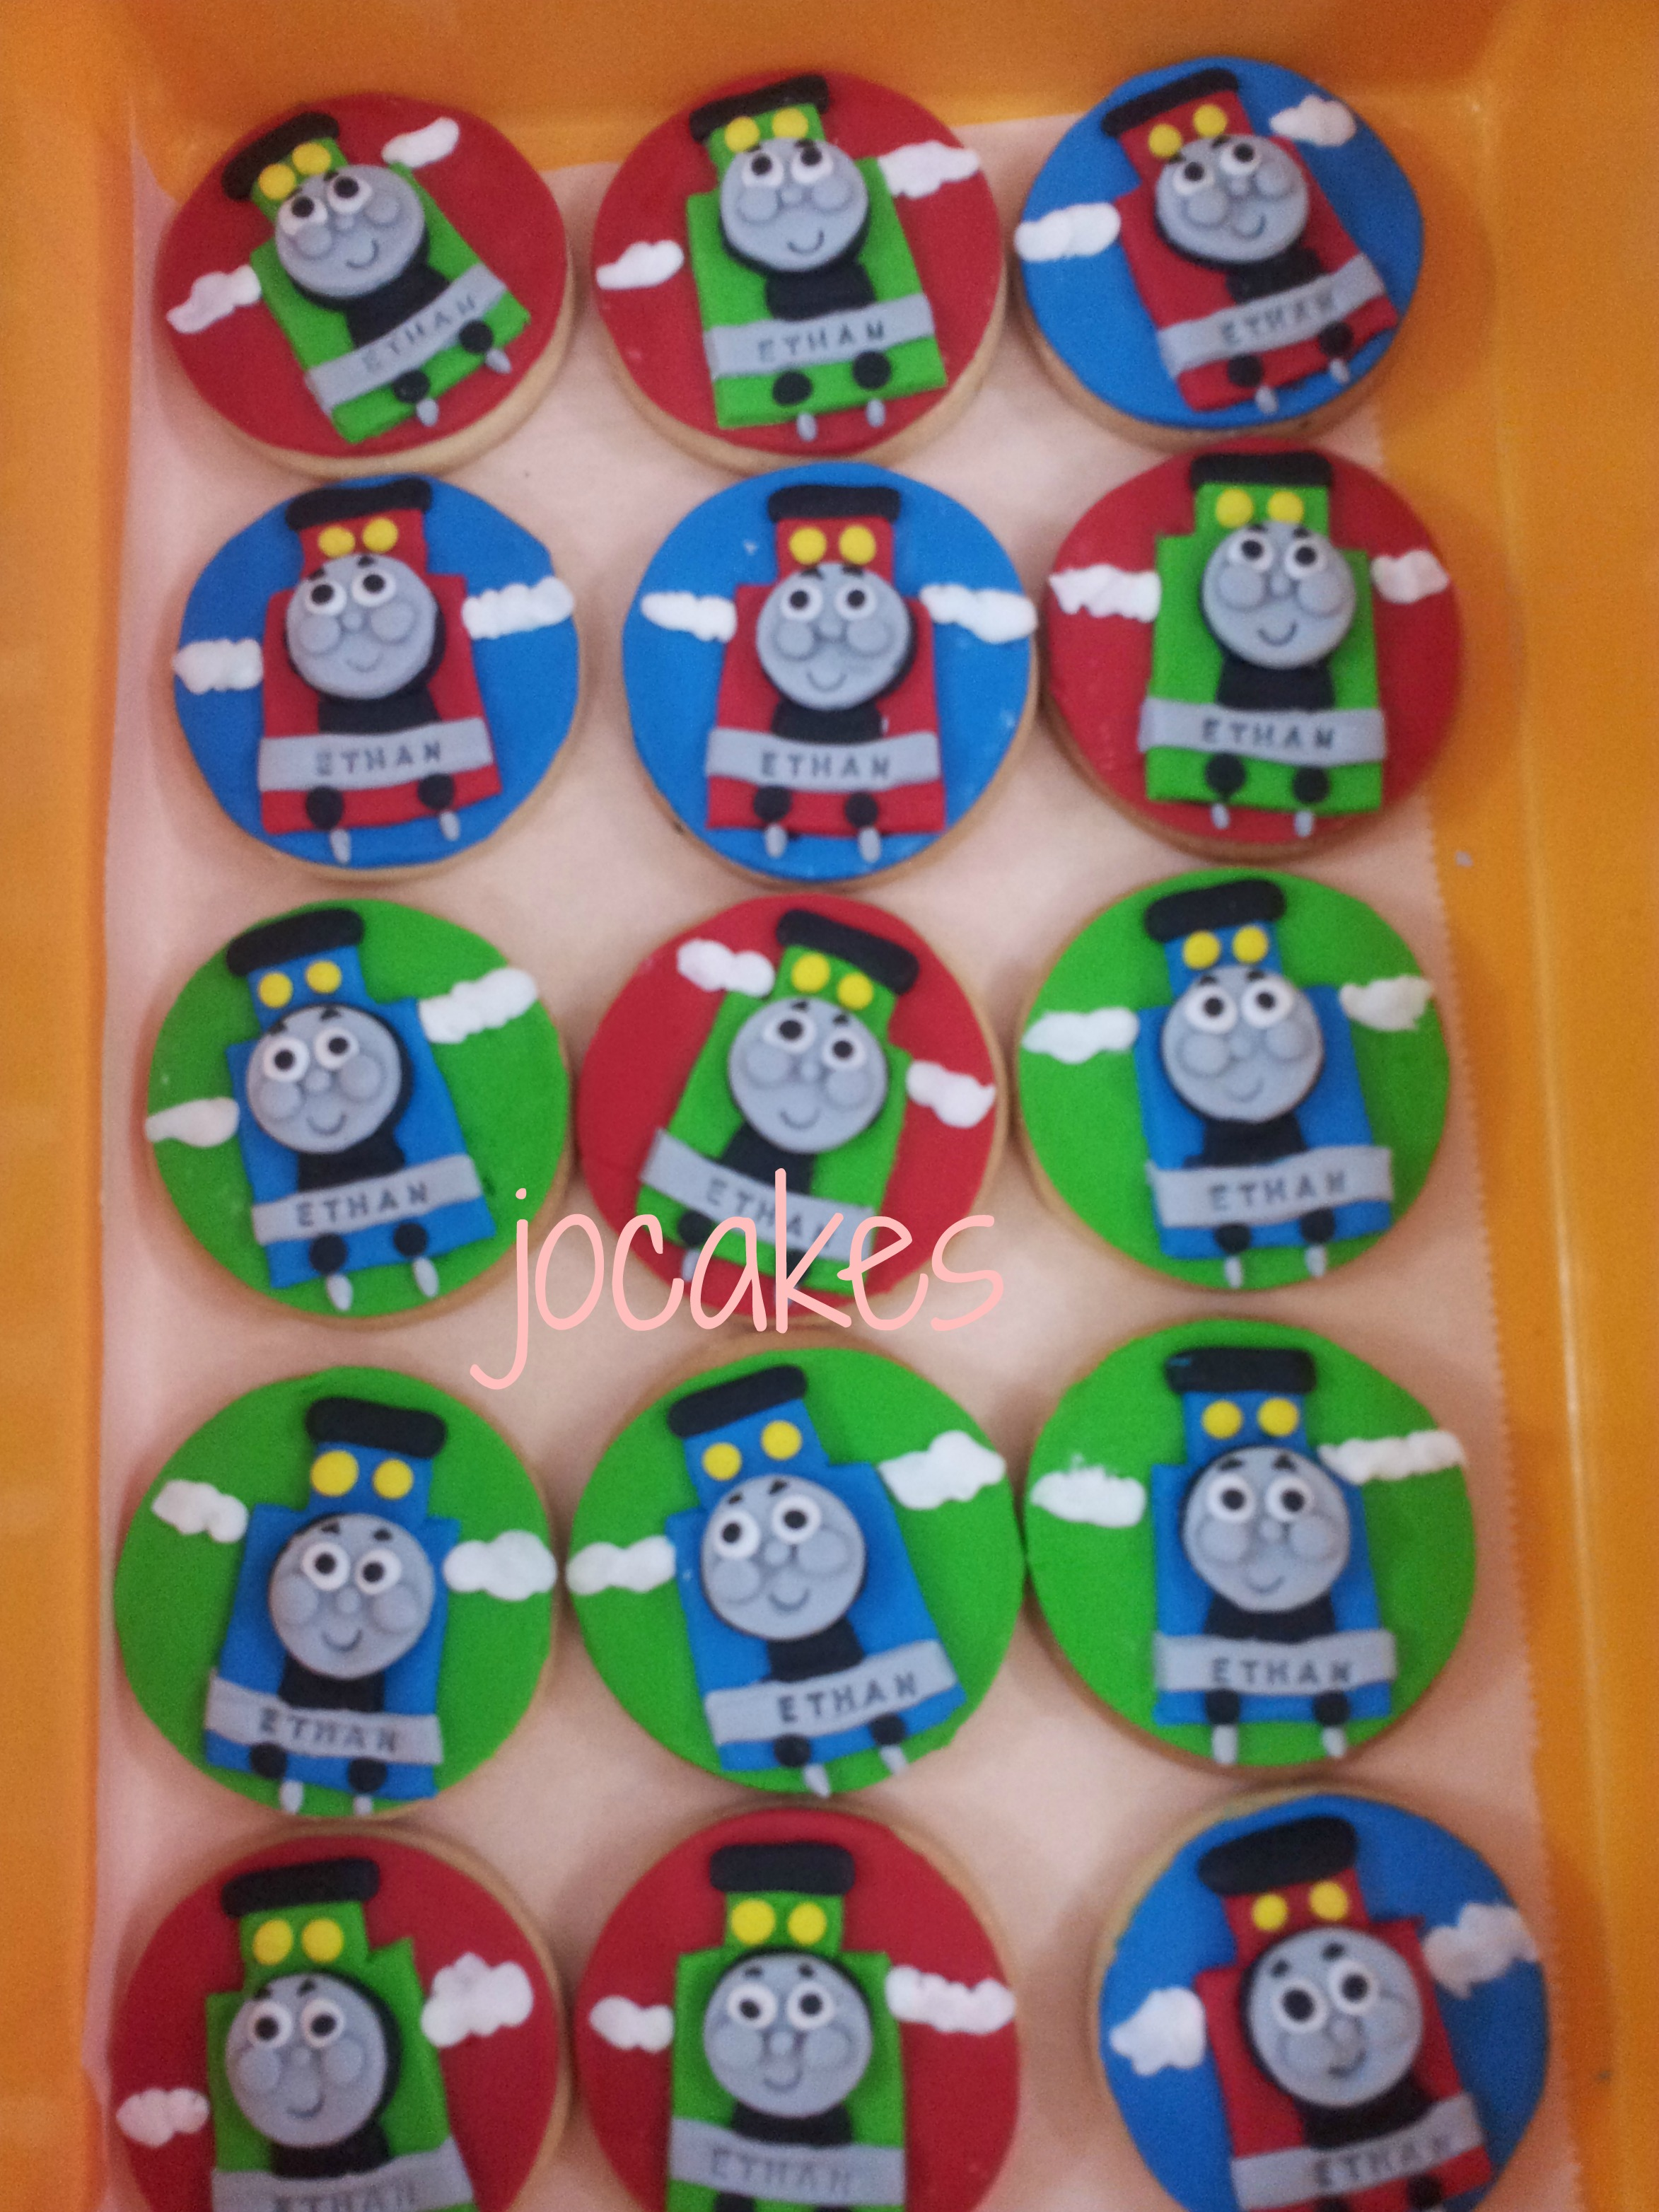 Thomas The Train Cookies Jocakes